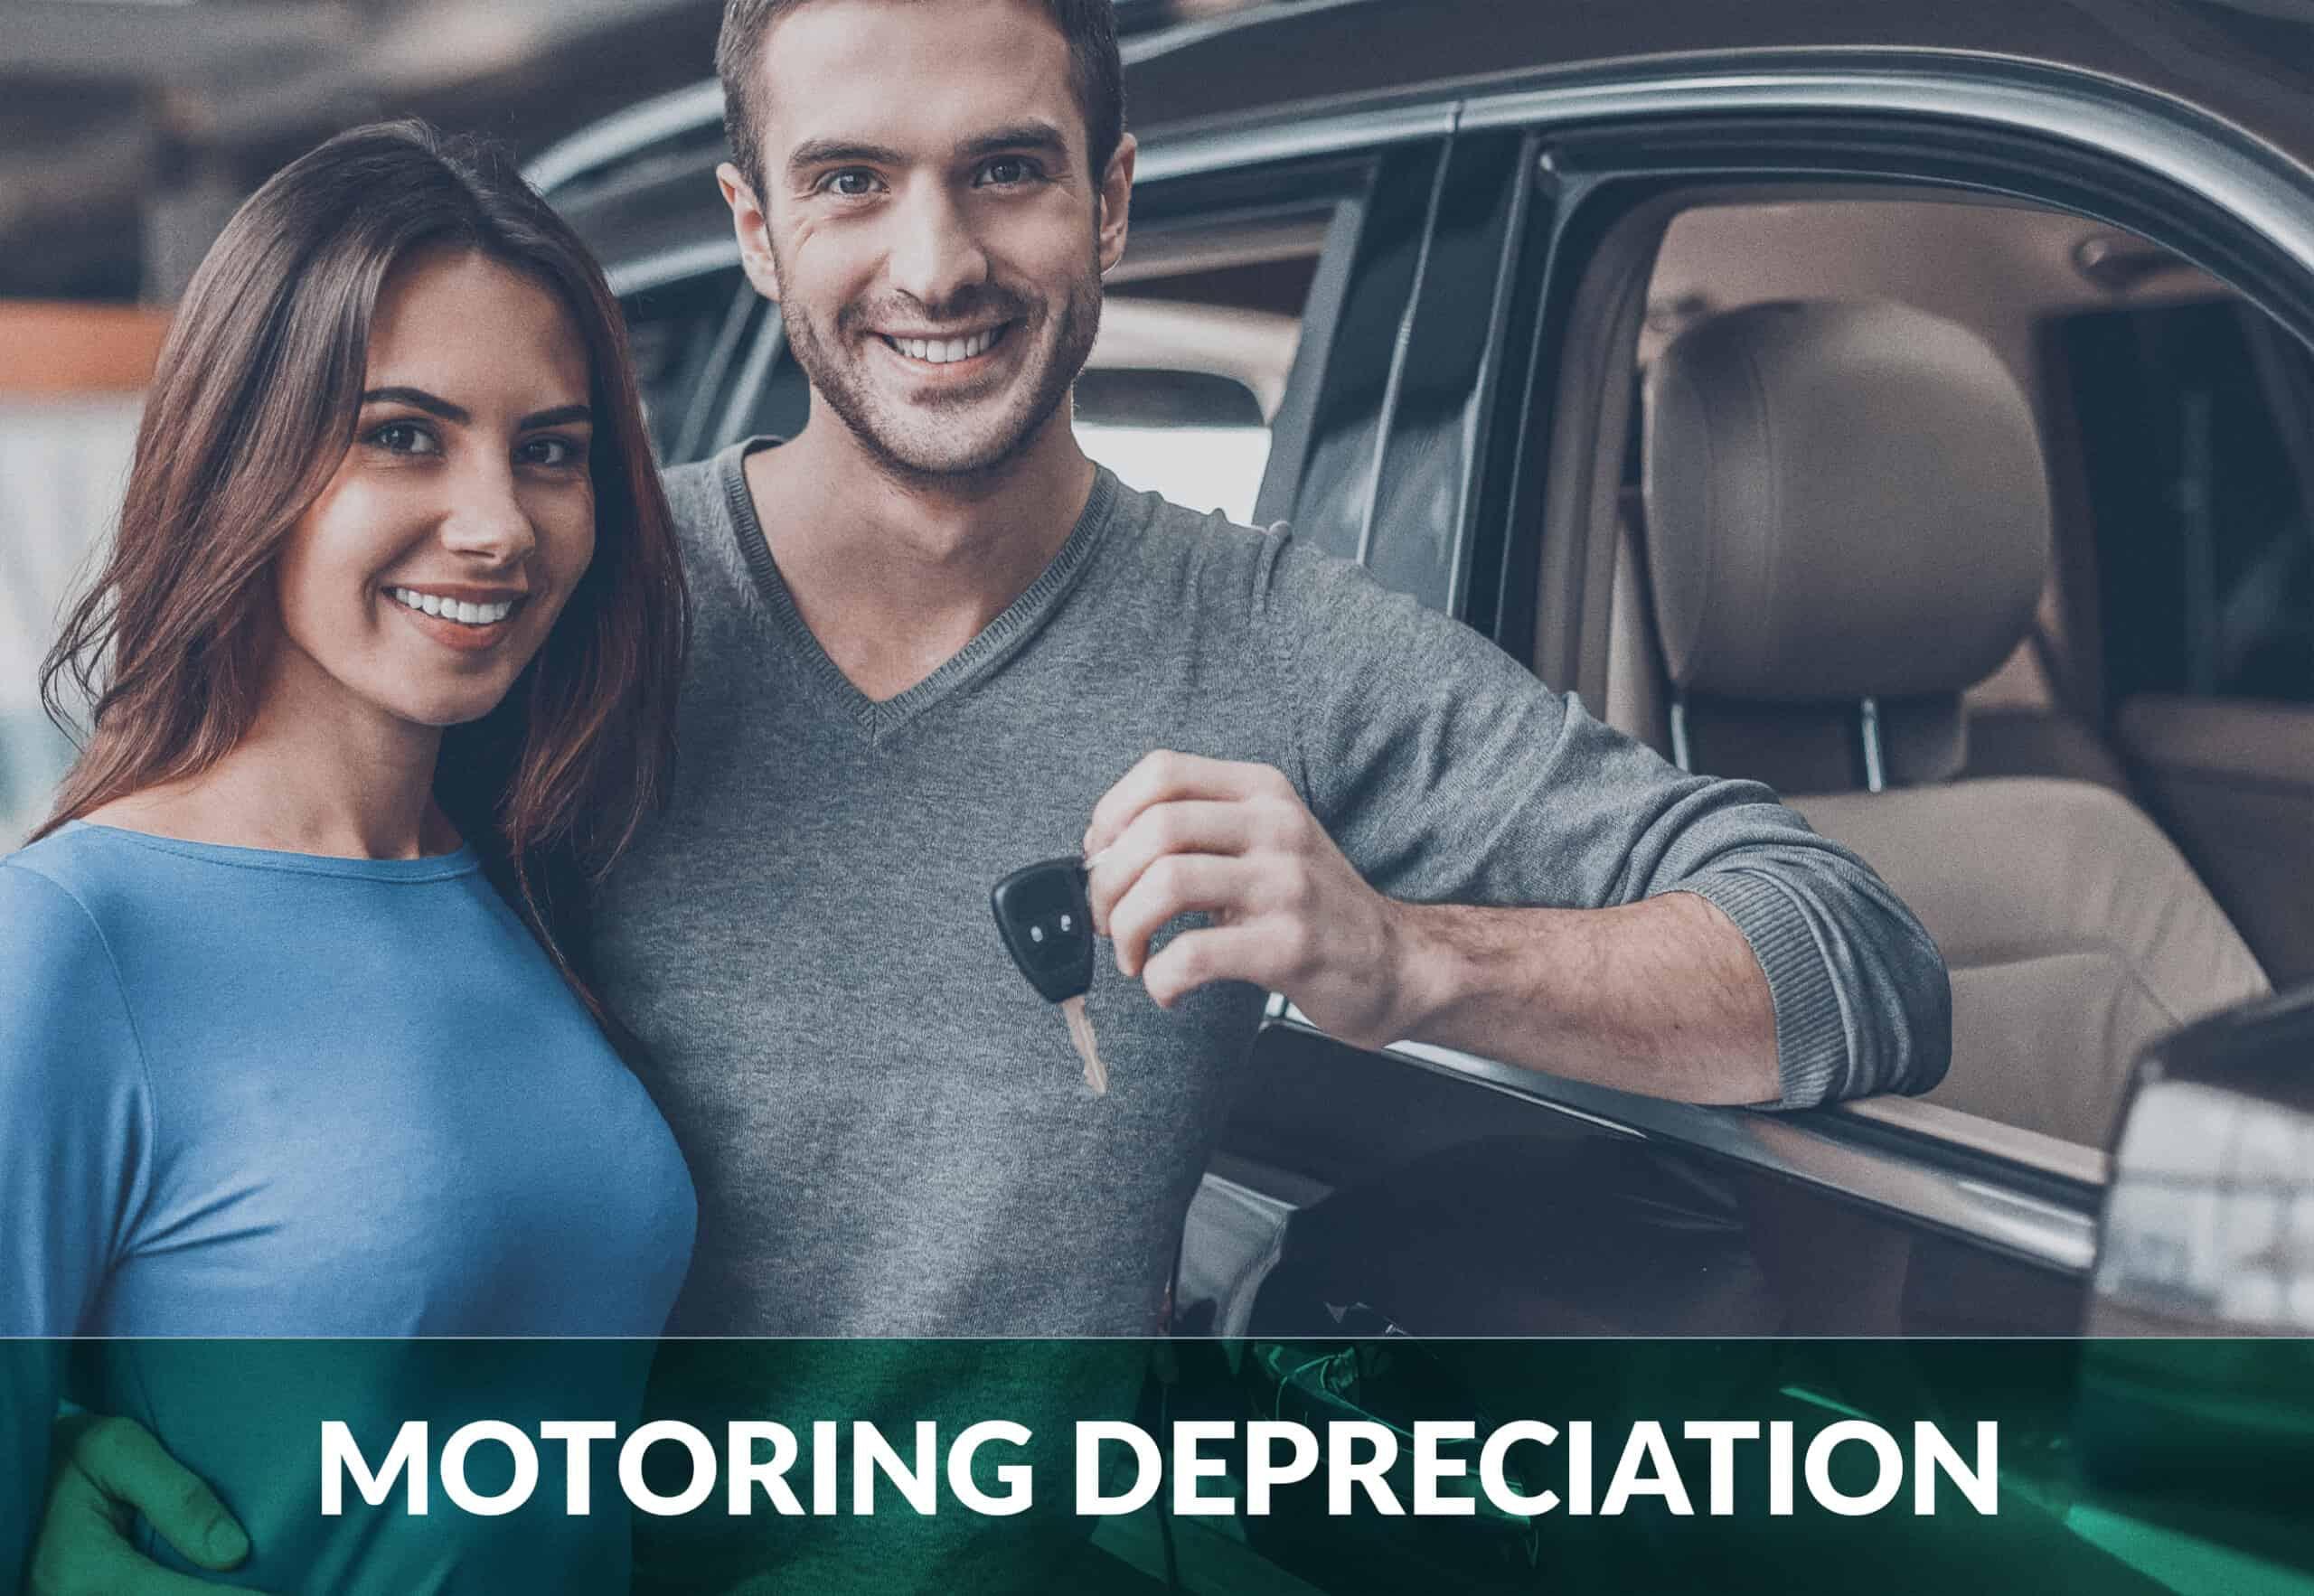 Motoring depreciation report